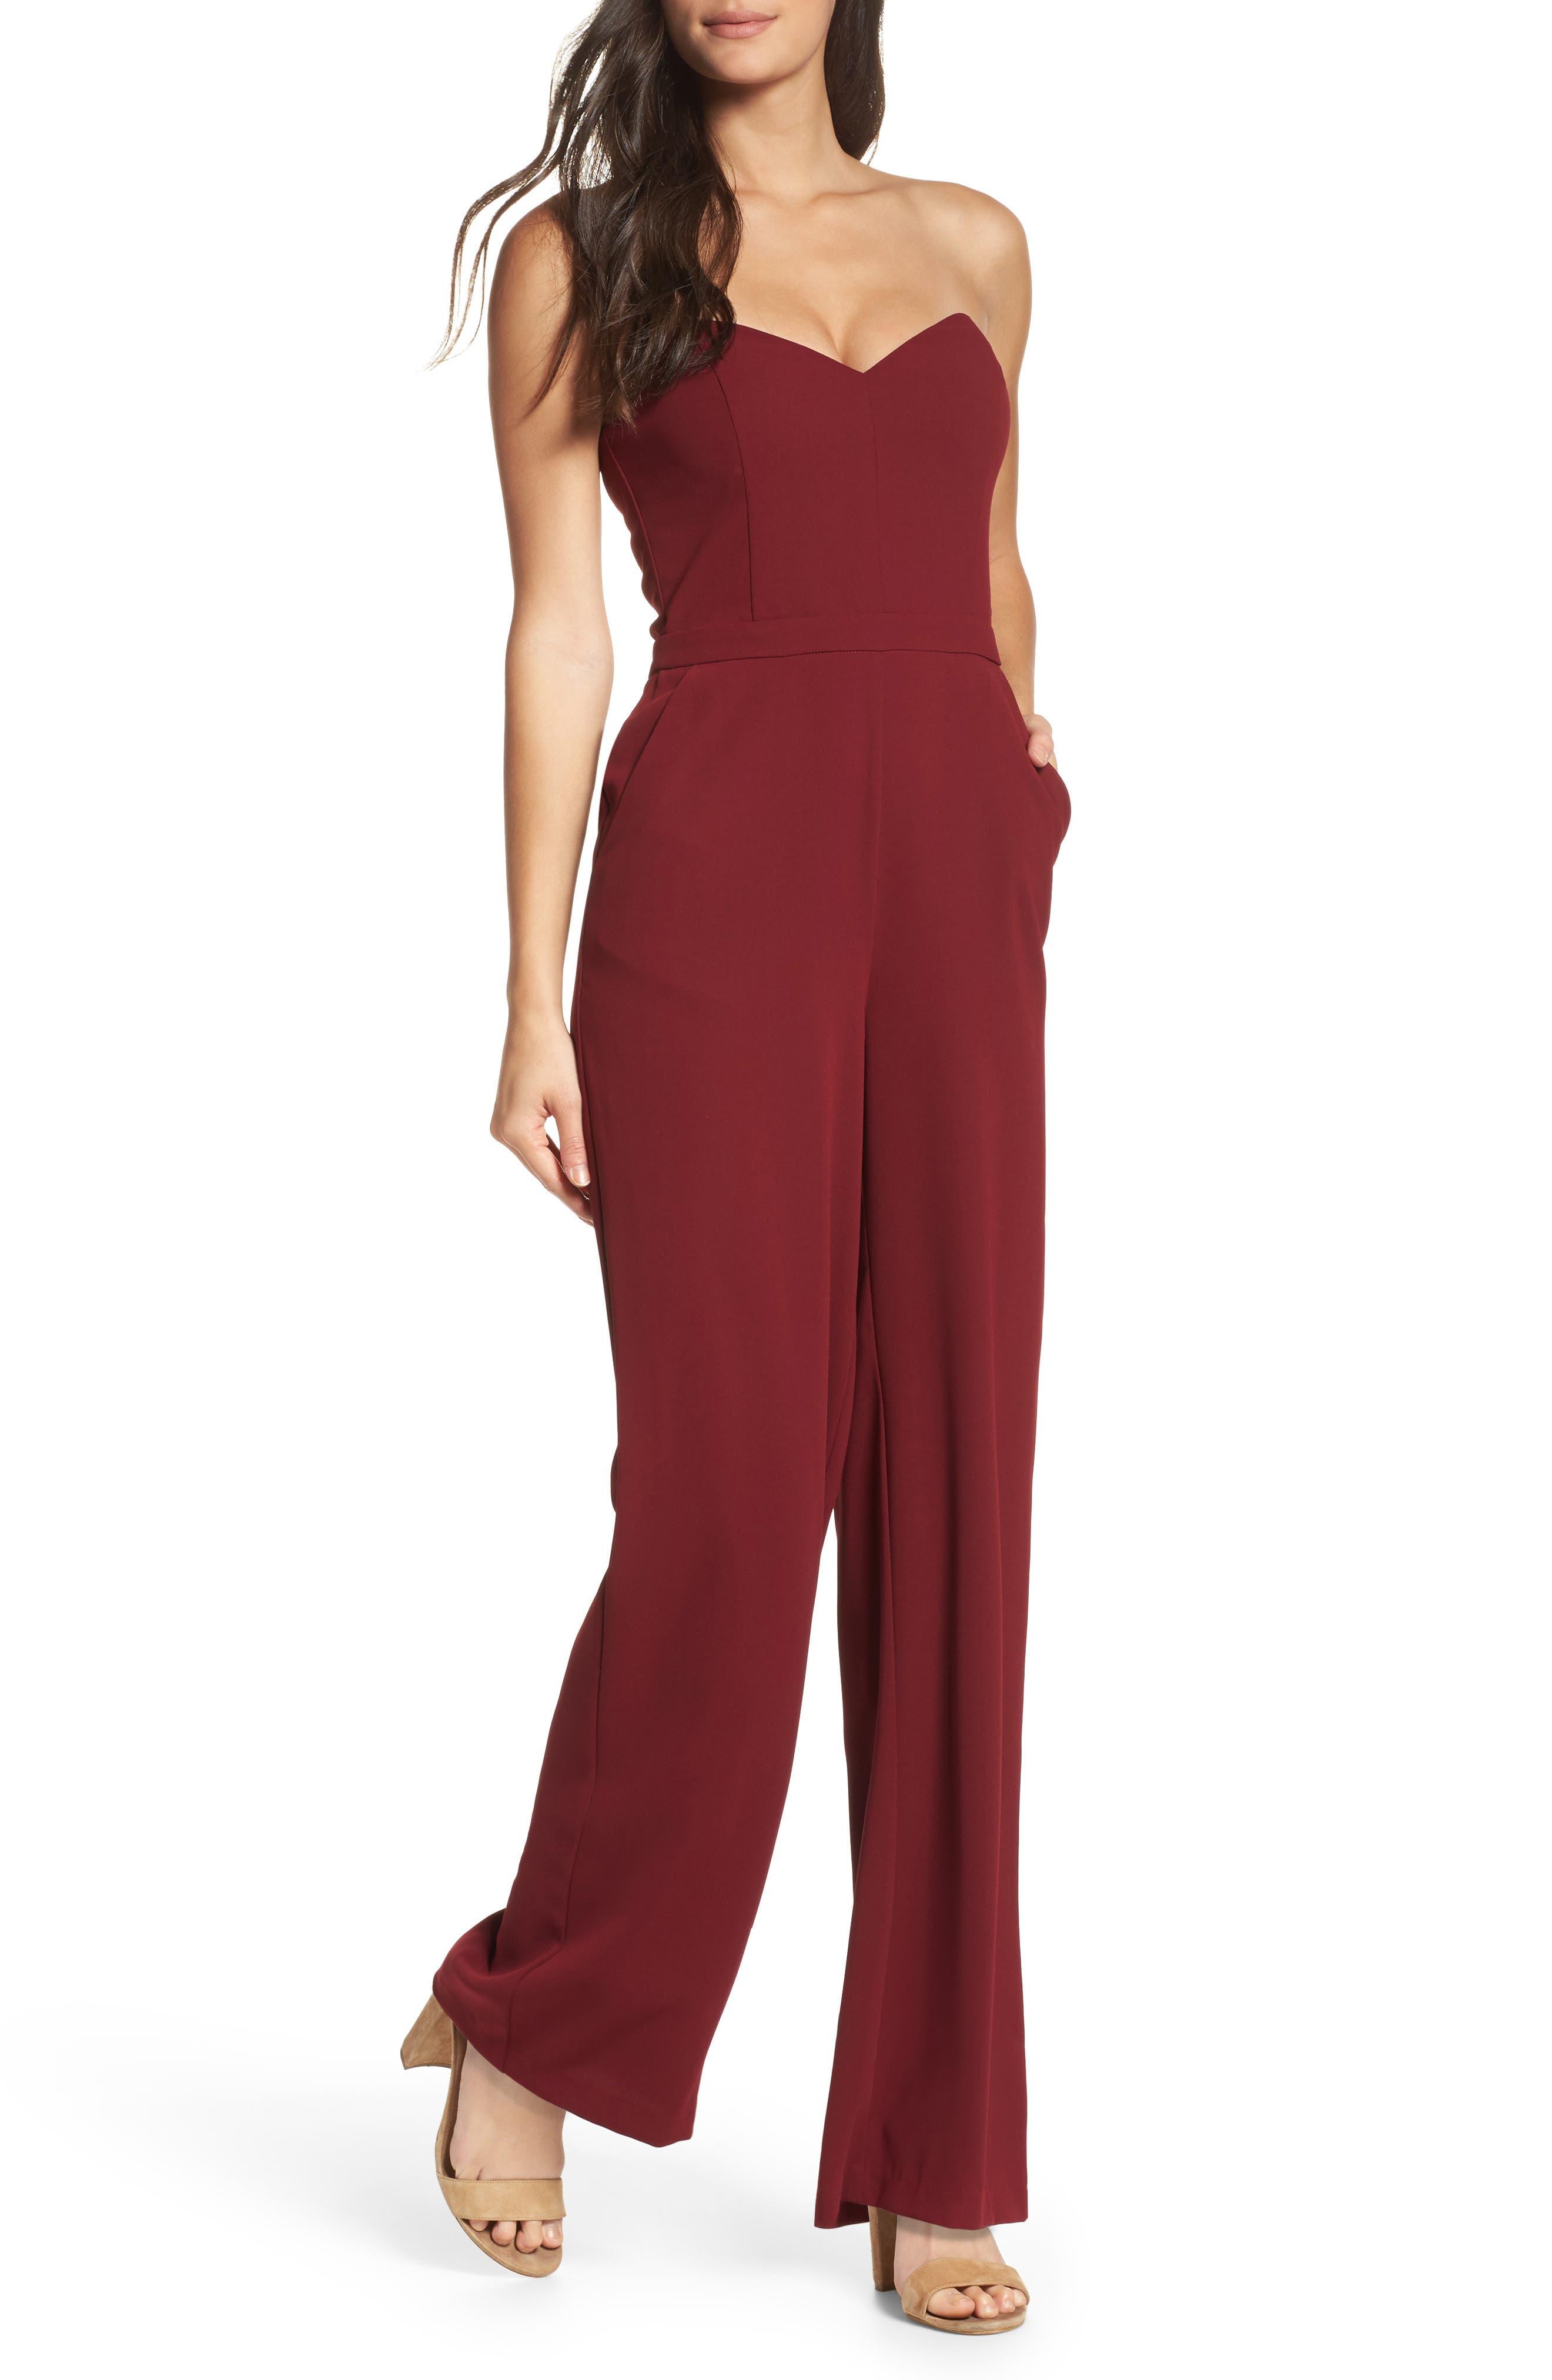 Elinda Strapless Jumpsuit,                         Main,                         color, 601